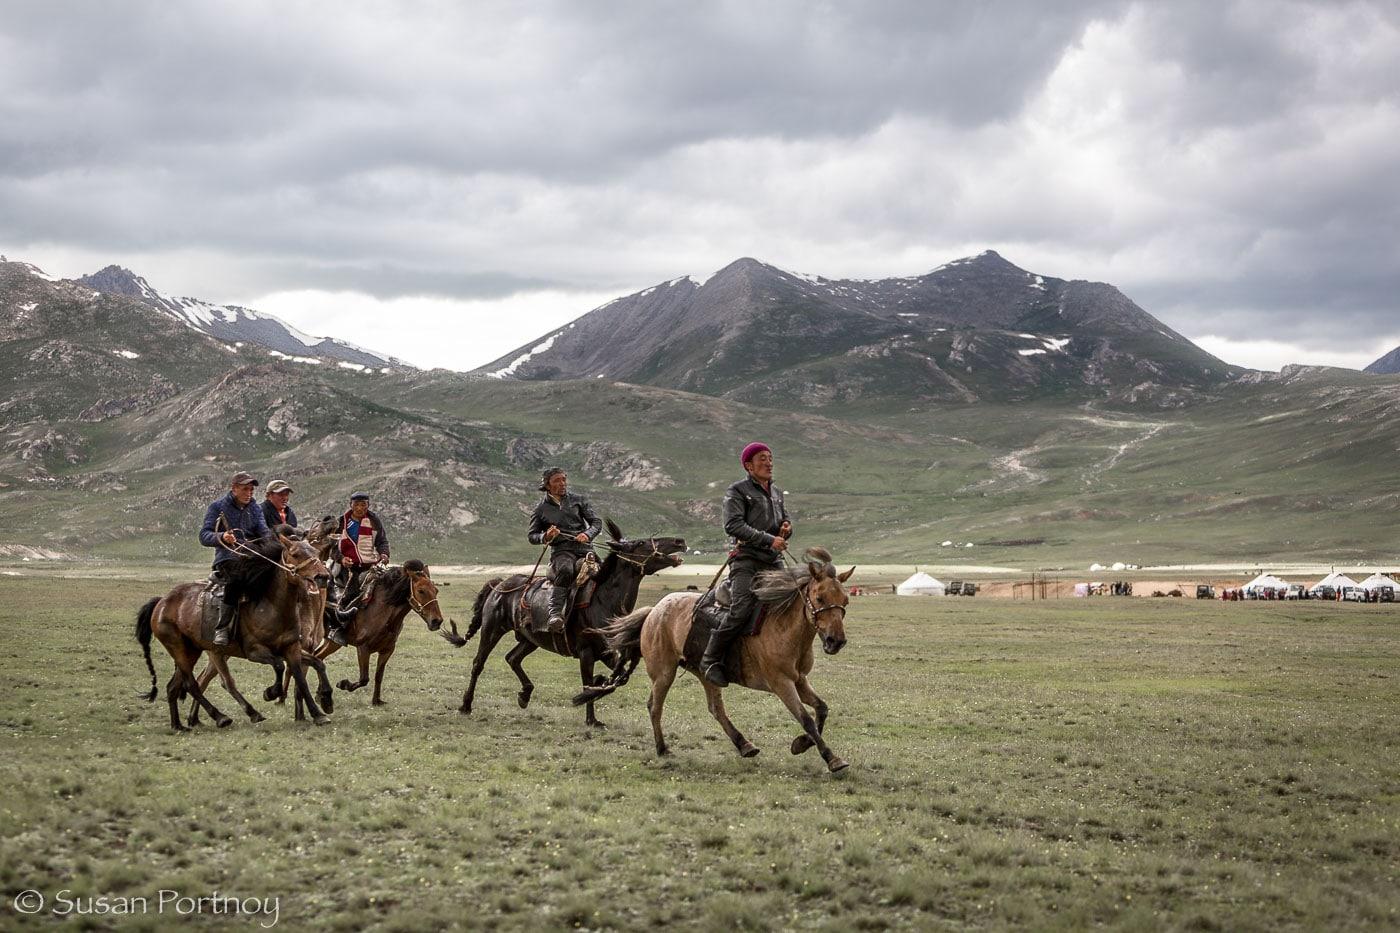 Kazakh riders race in the Altai Tavan Bogd National Park, Mongolia